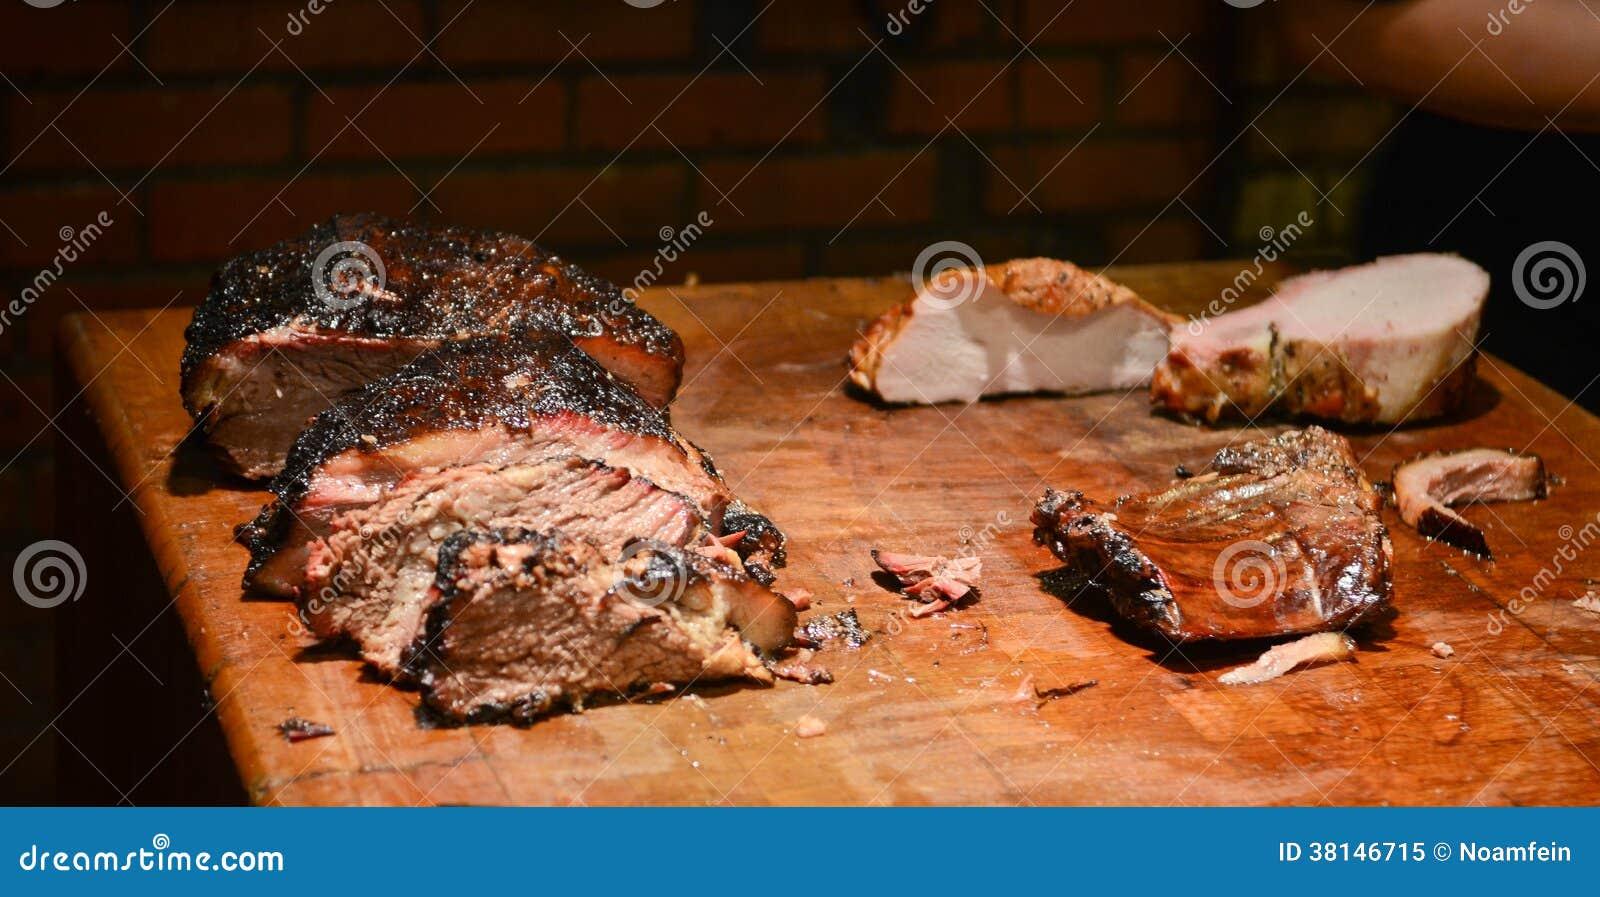 Texas BBQ meat